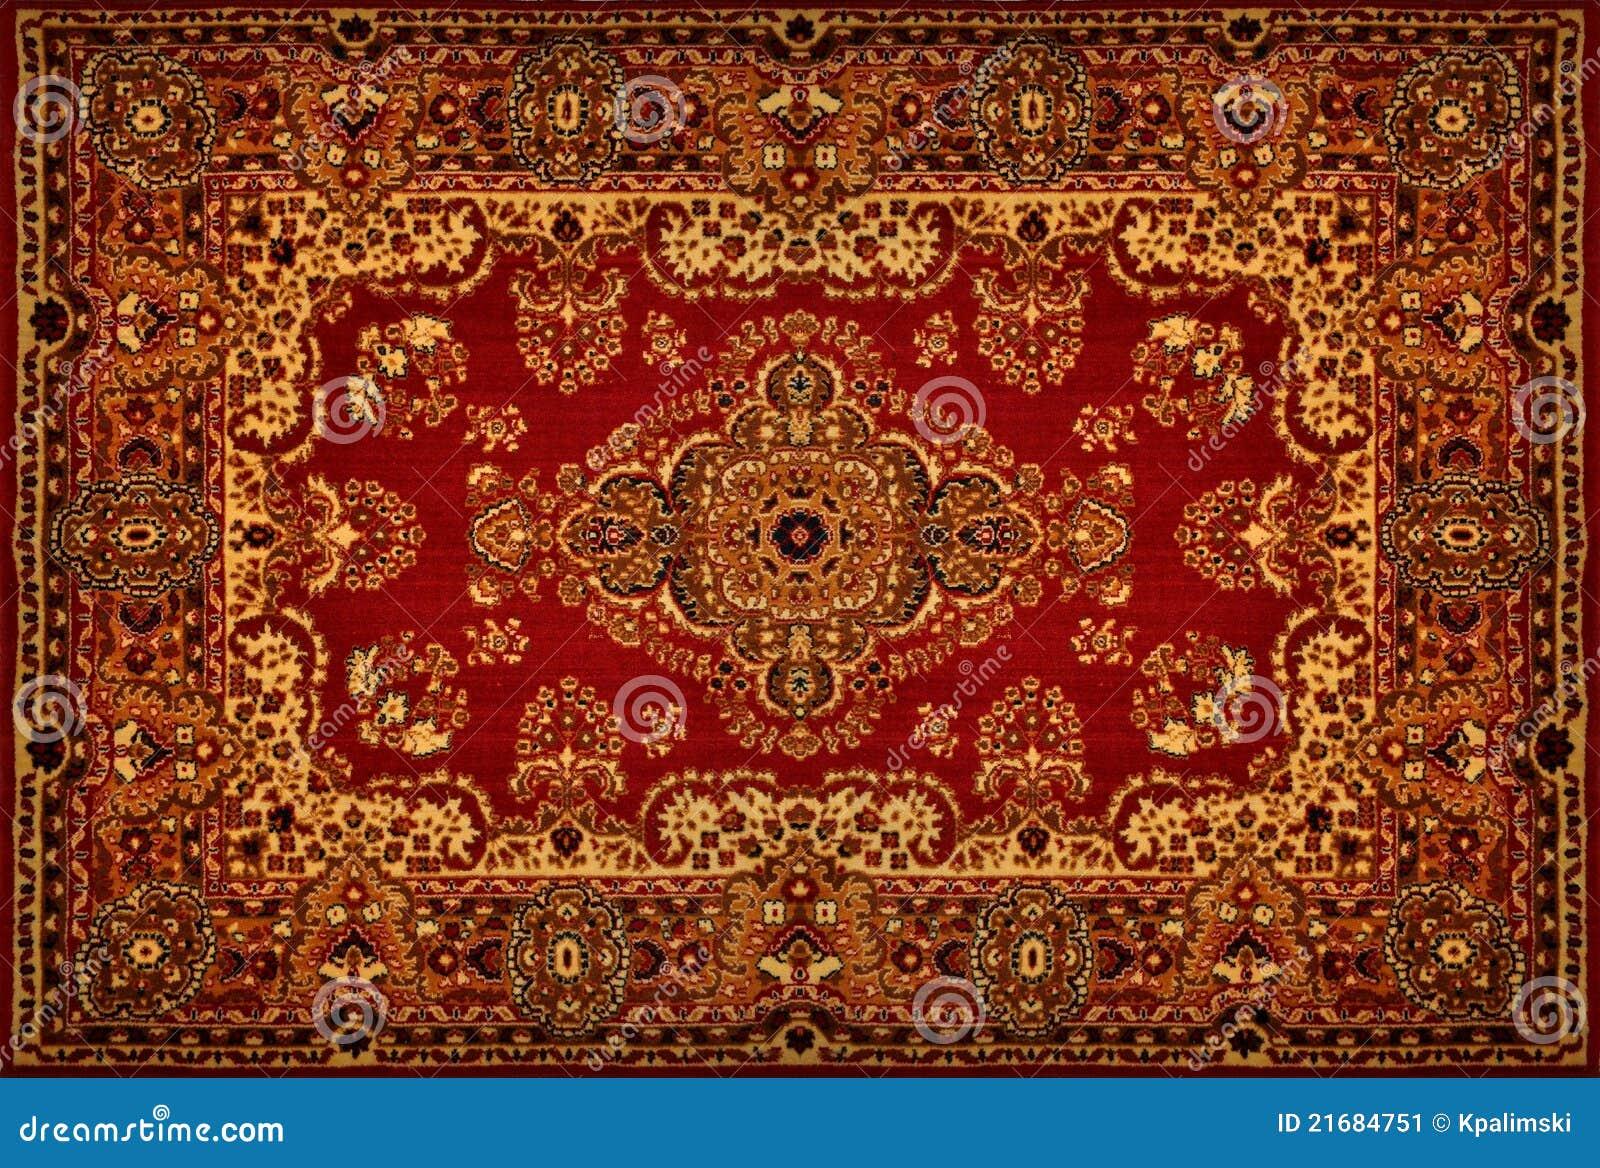 Persian Carpet Texture Stock Image Image Of Border